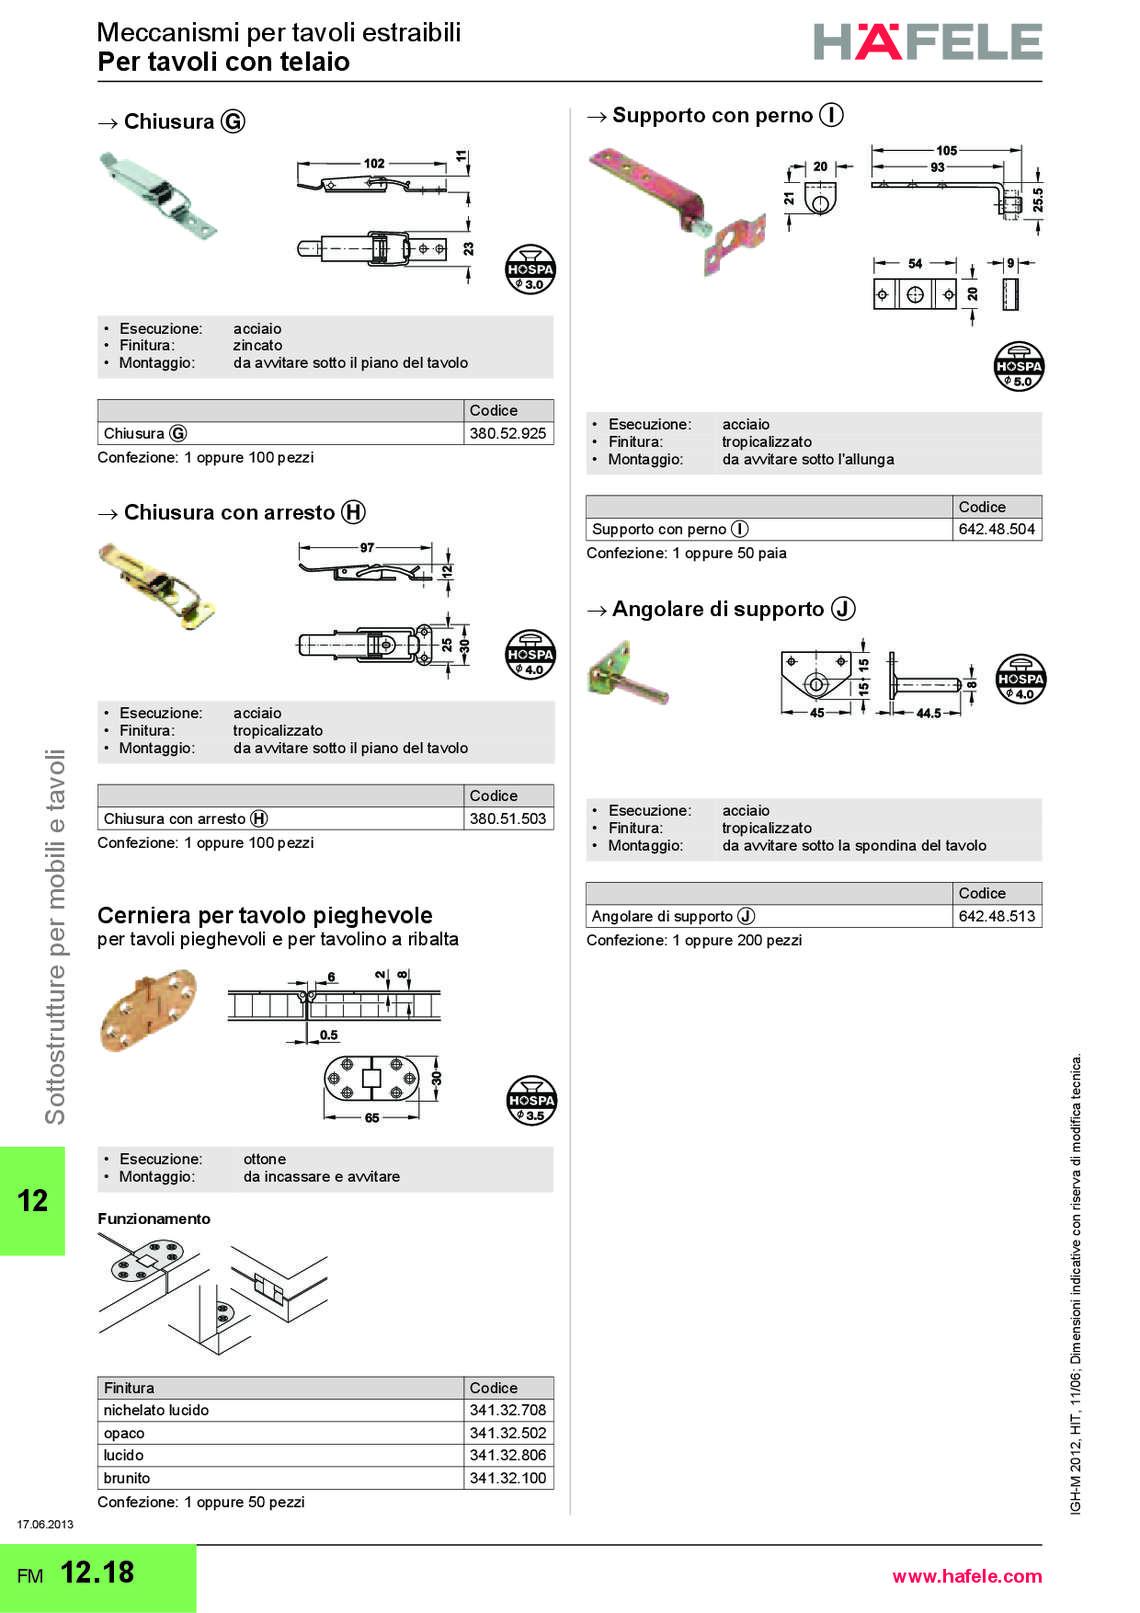 hafele-sottostrutture-per-mobili_83_033.jpg